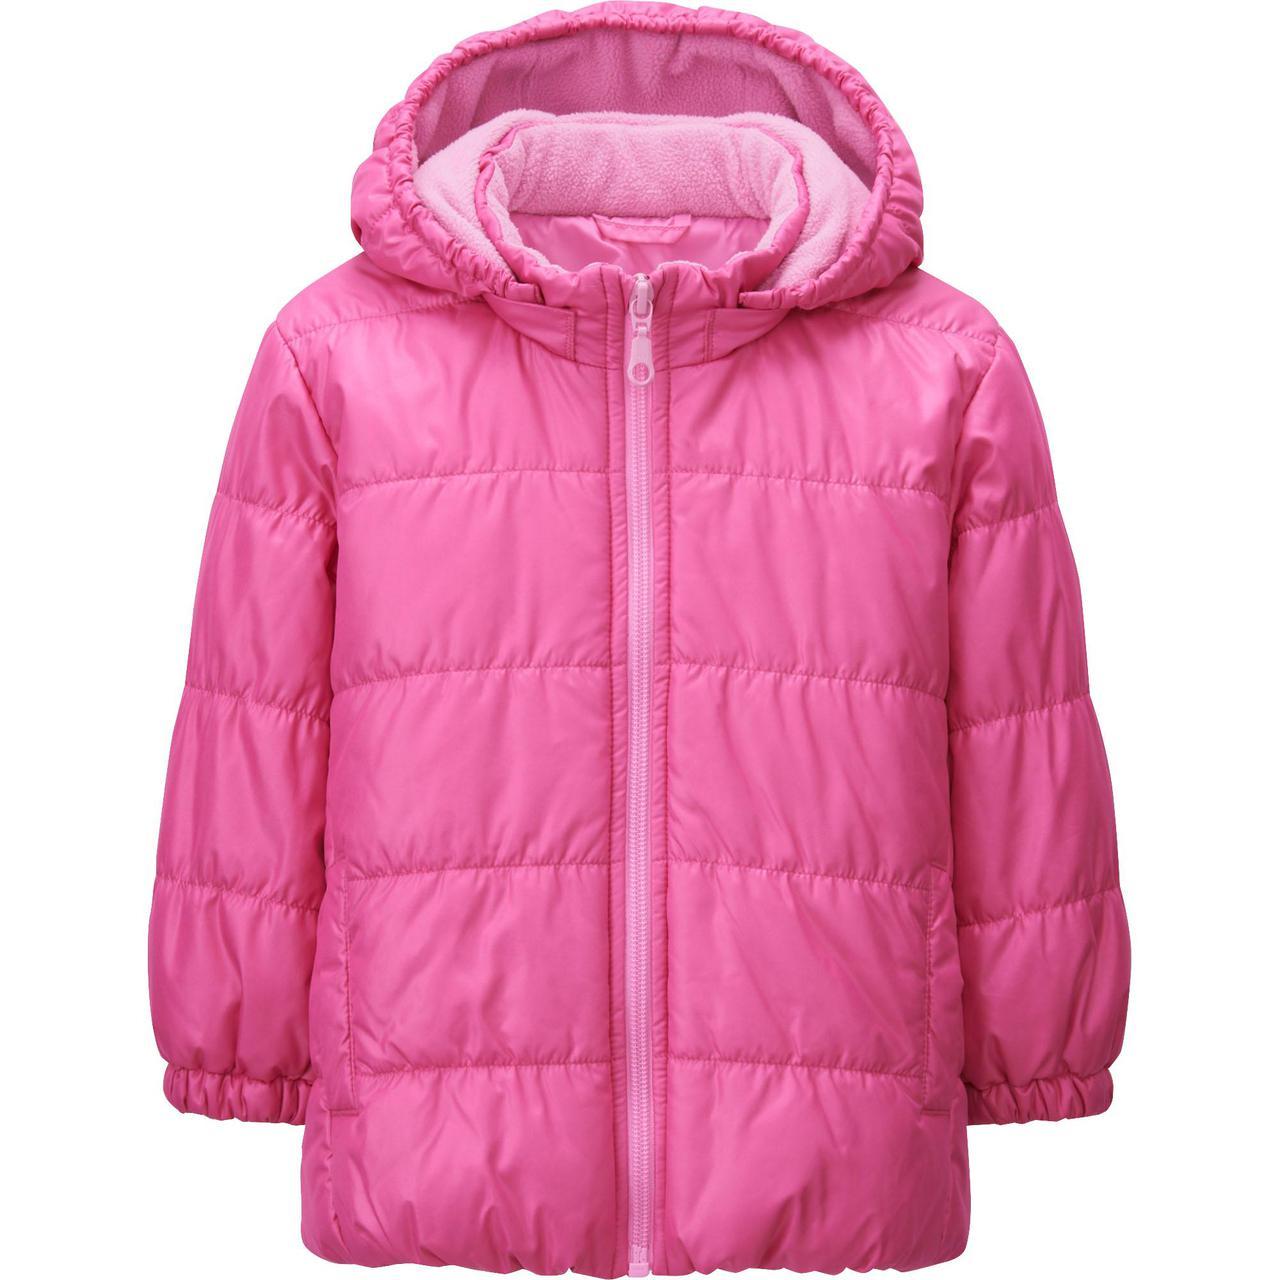 Куртка детская Uniqlo toddler warm lite jacket PINK